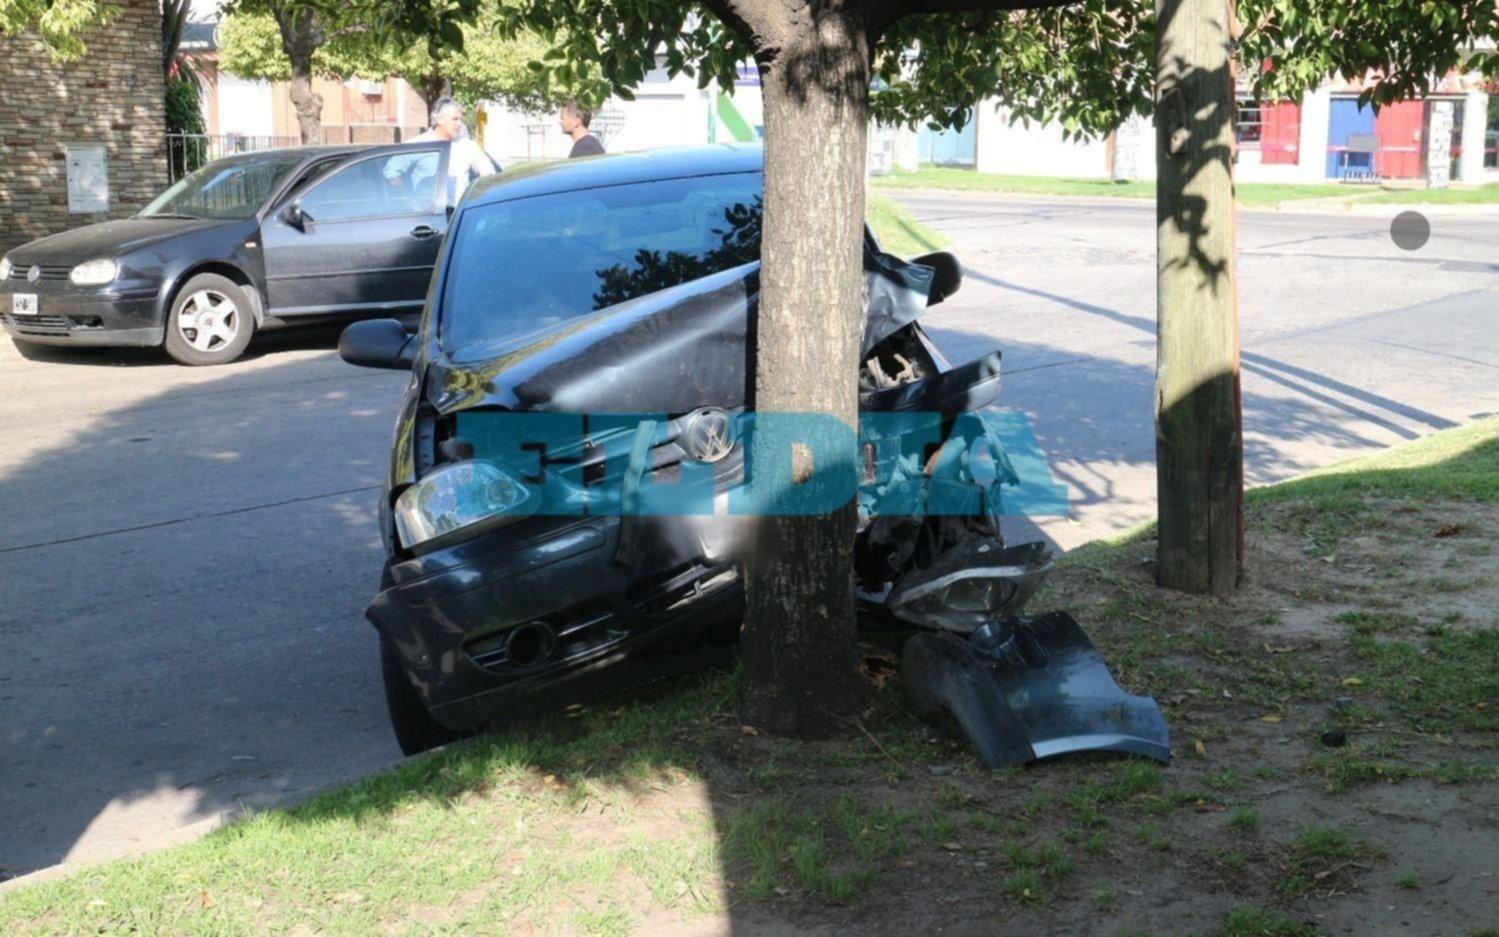 Un auto se estrelló contra un árbol a metros de la 520